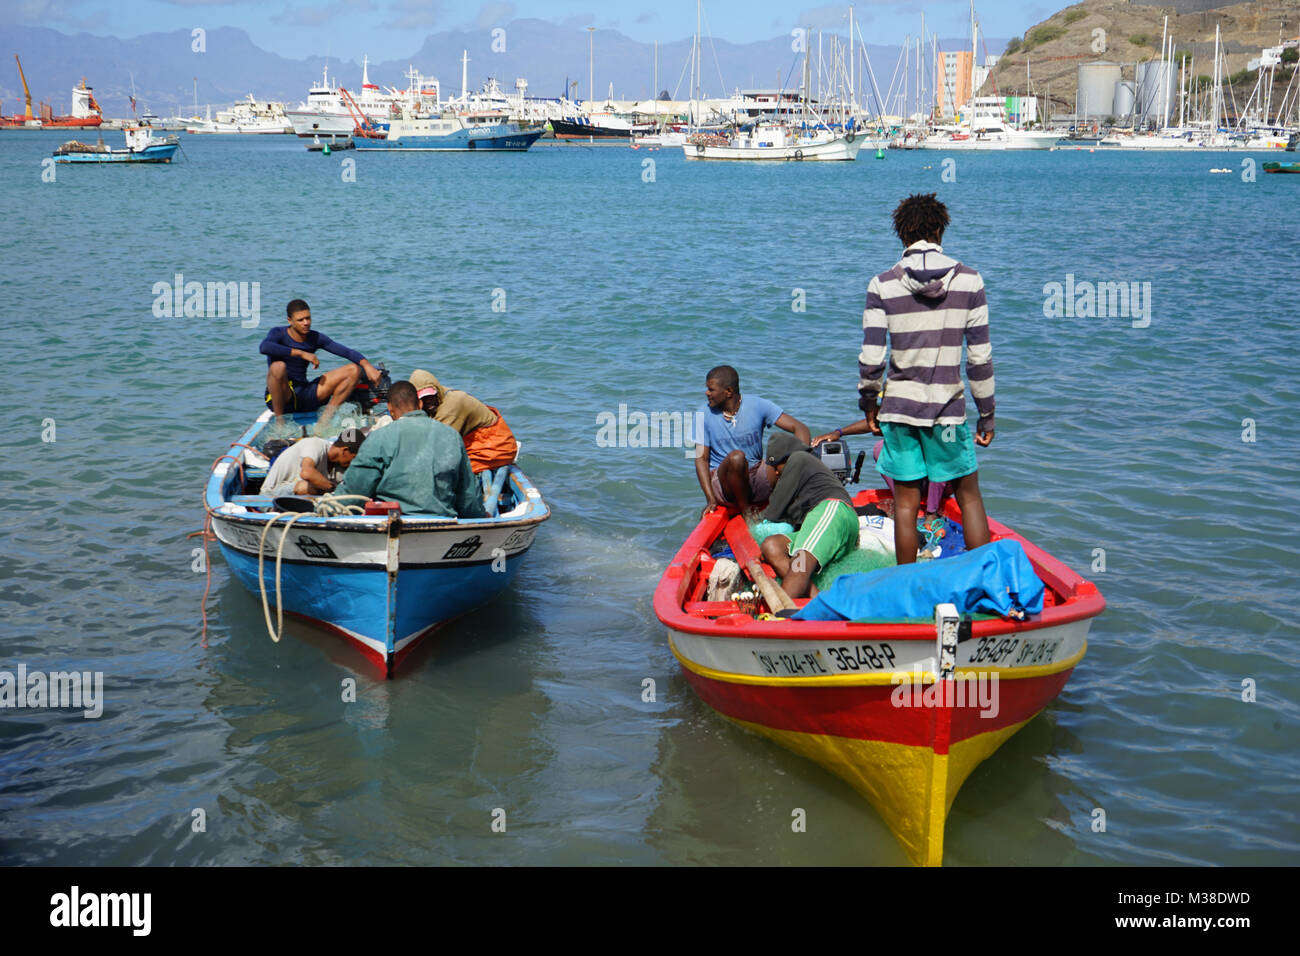 Fishermen unloading Boats, Fish Market, Mindelo, Cape Verde Stock Photo